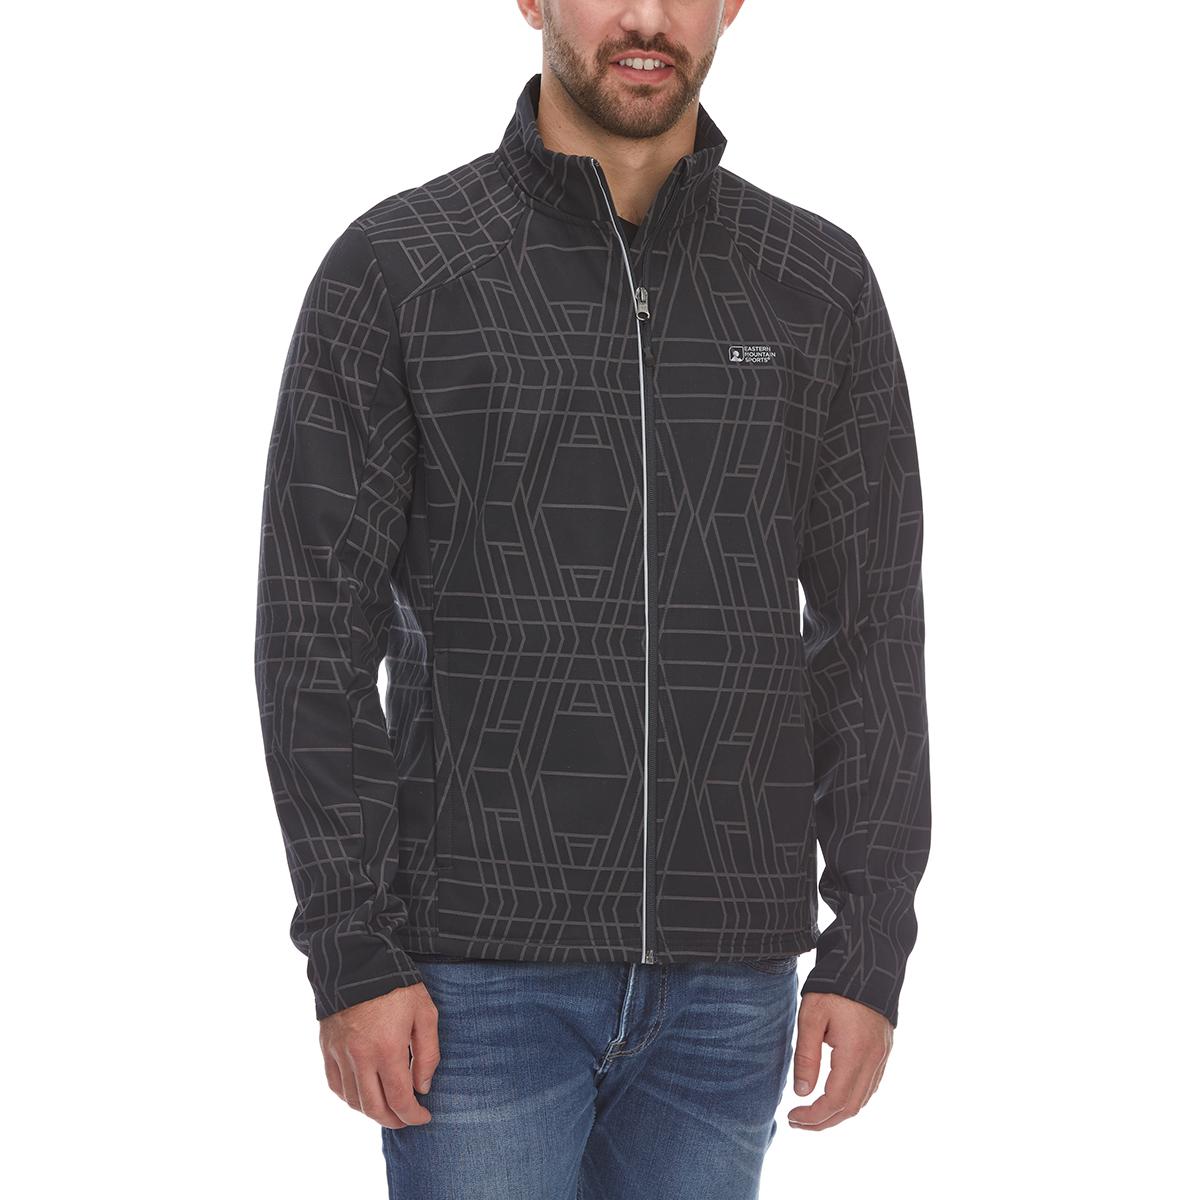 Ems Men's Reflective Softshell Jacket - Black, XXL